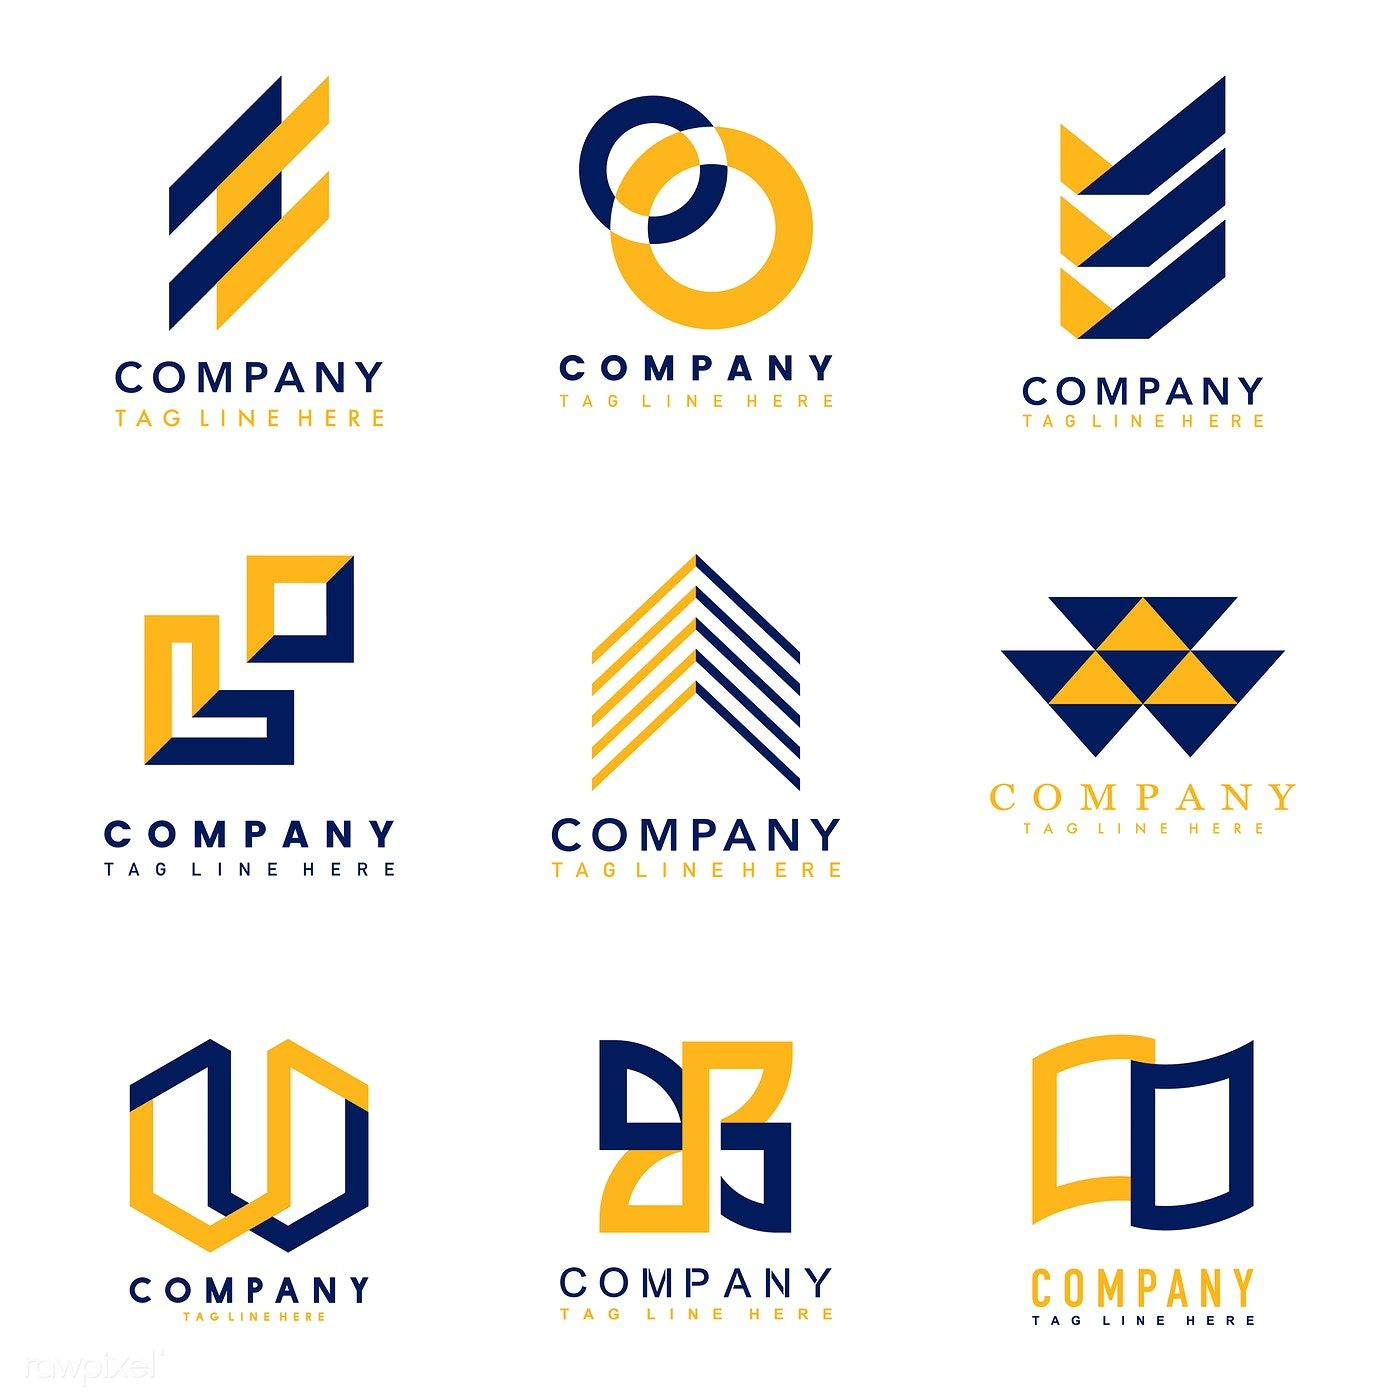 Download premium vector of Set of company logo design